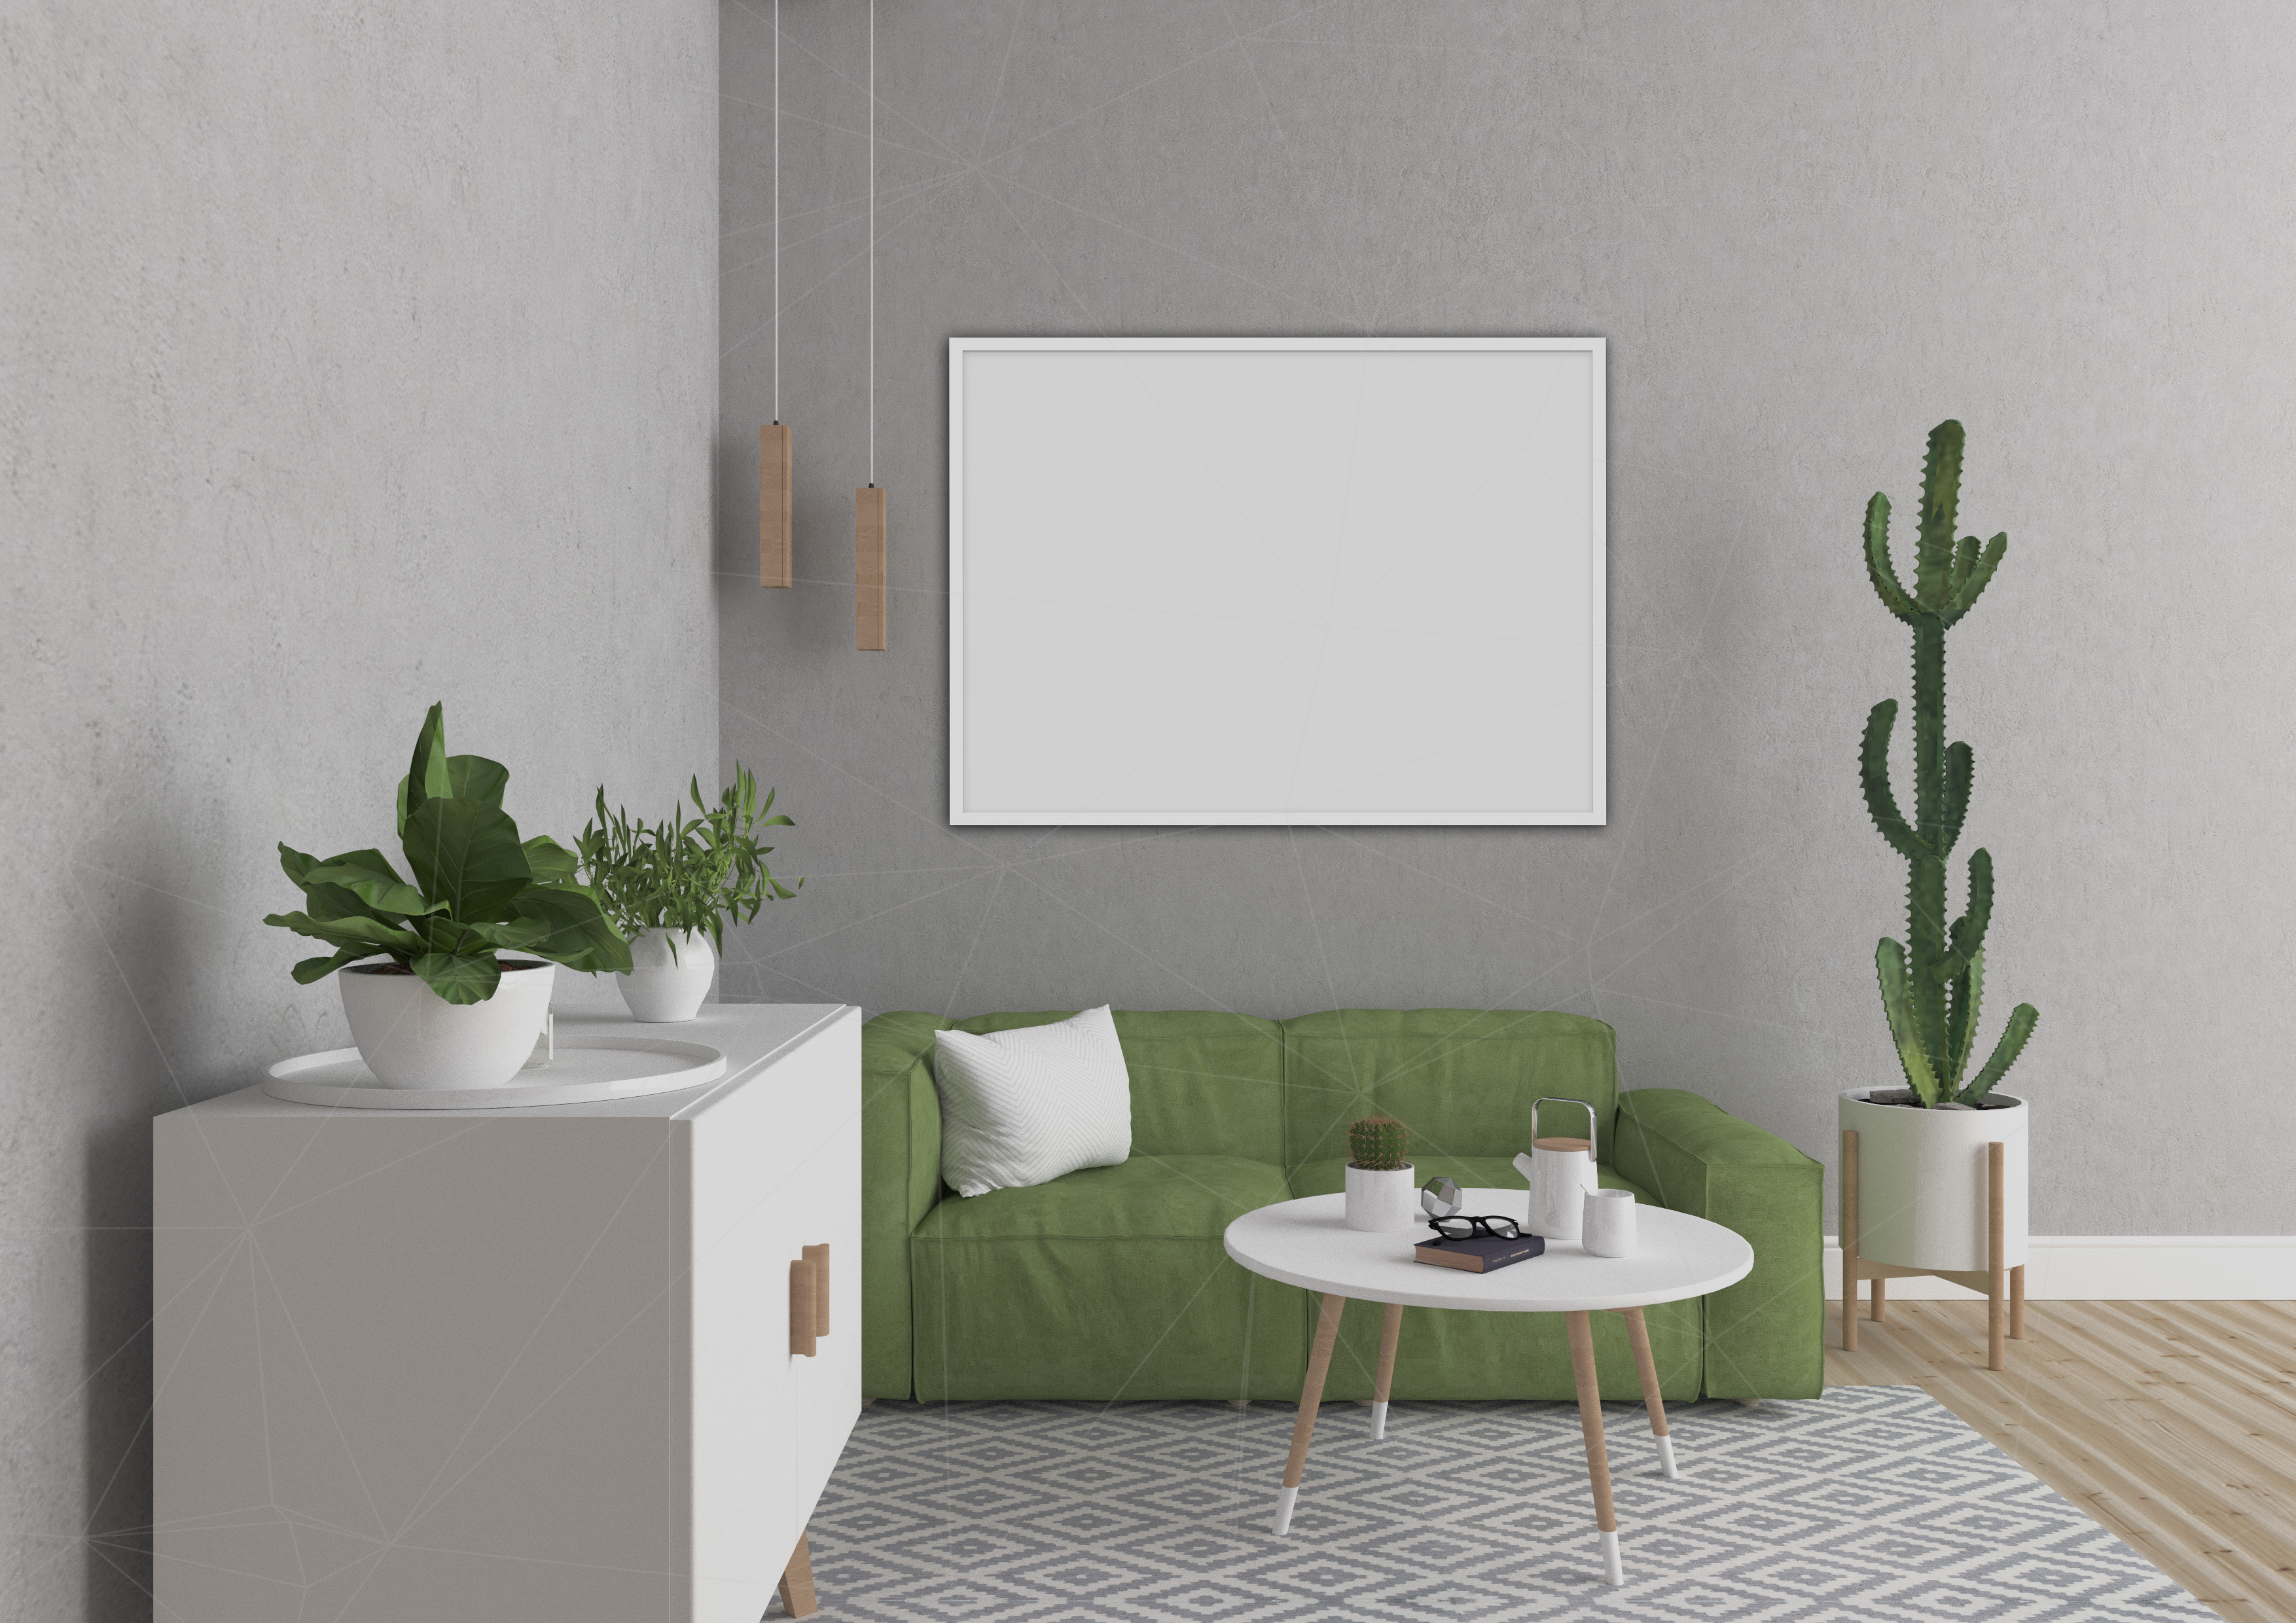 Interior mockup bundle - blank wall mock up example image 2